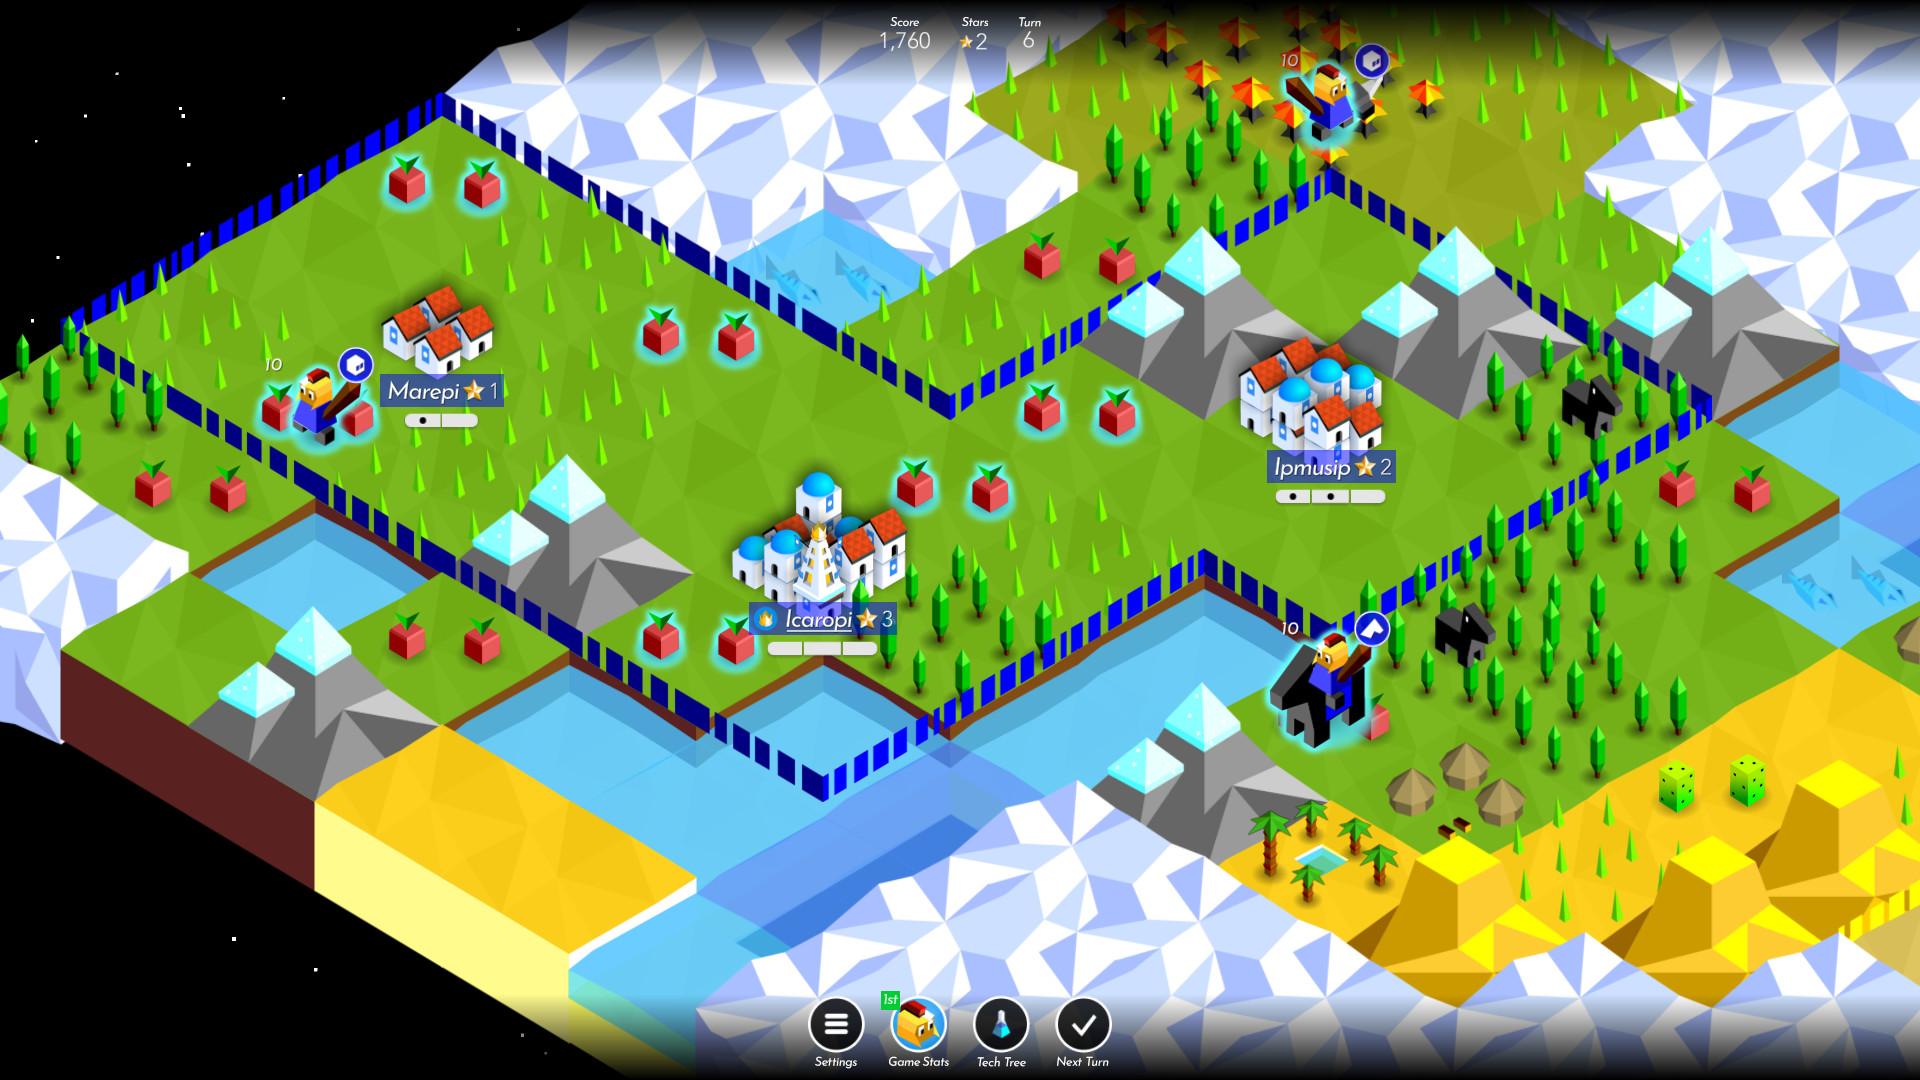 Battle of Polytopia 2 - Top underappreciated indie games of 2020